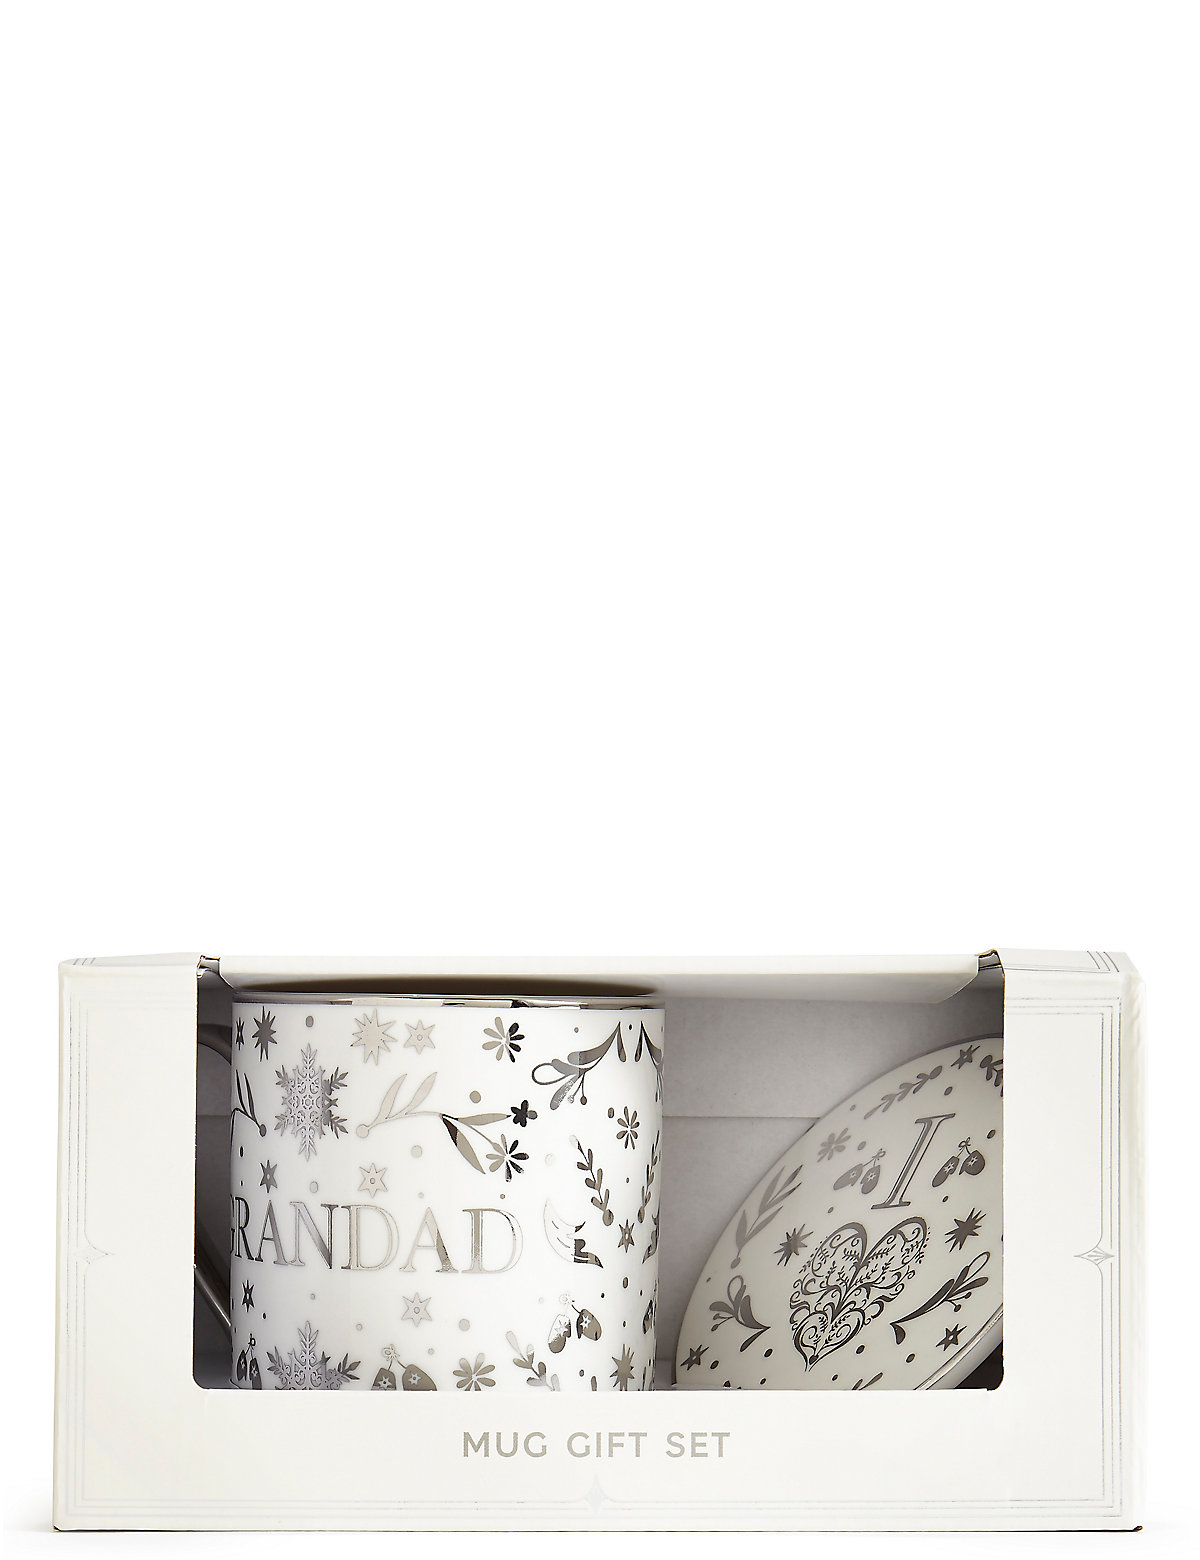 Grandad Mug & Coaster Gift Set